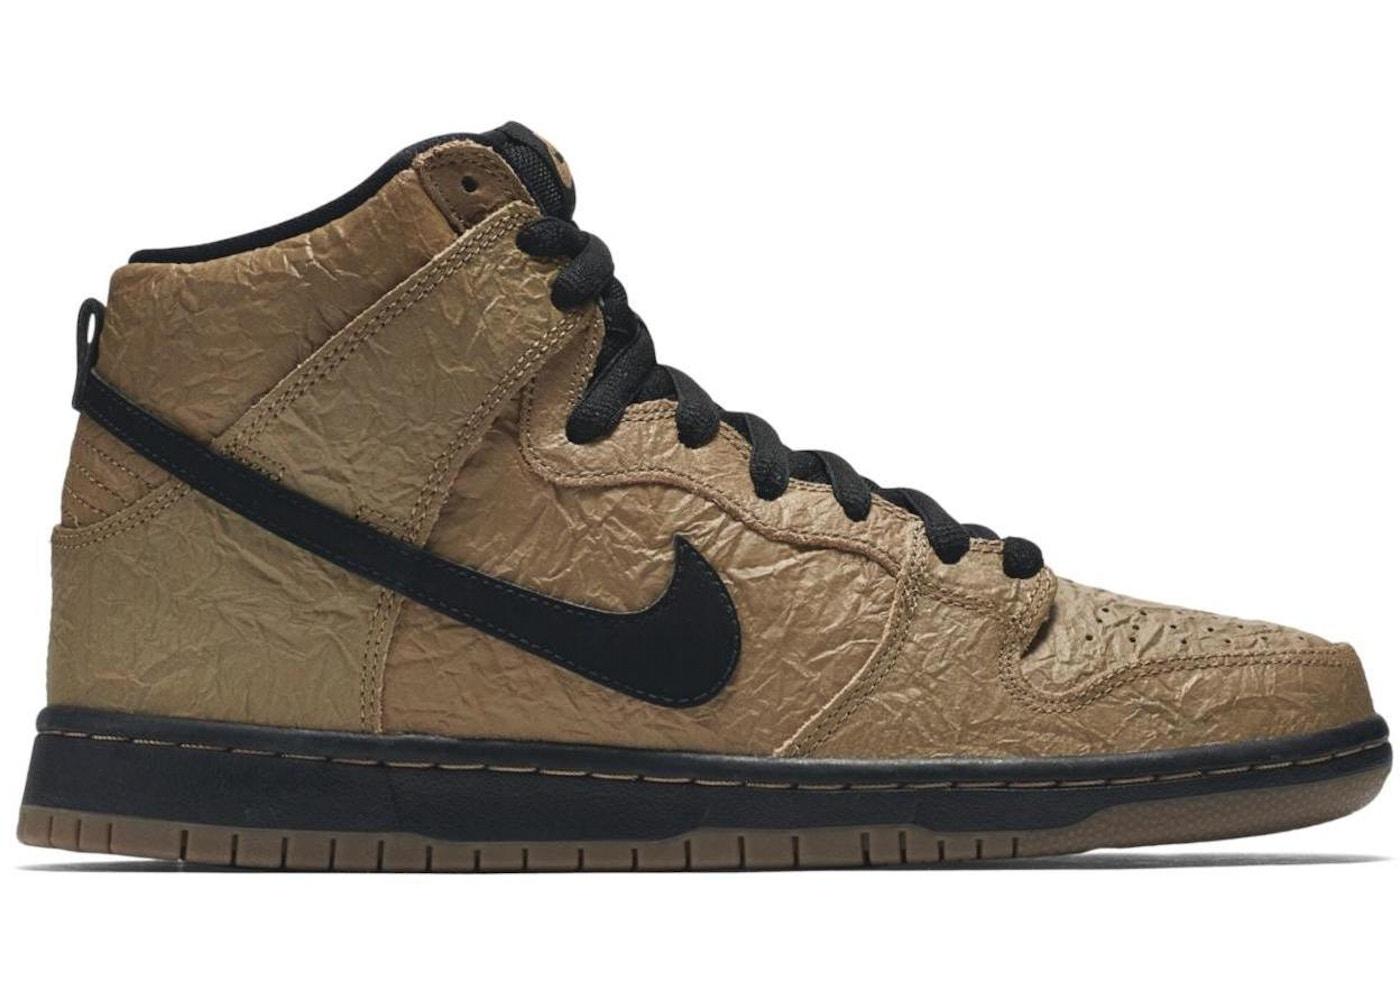 0a204579 Nike Dunk SB High Brown Bag - 313171-202